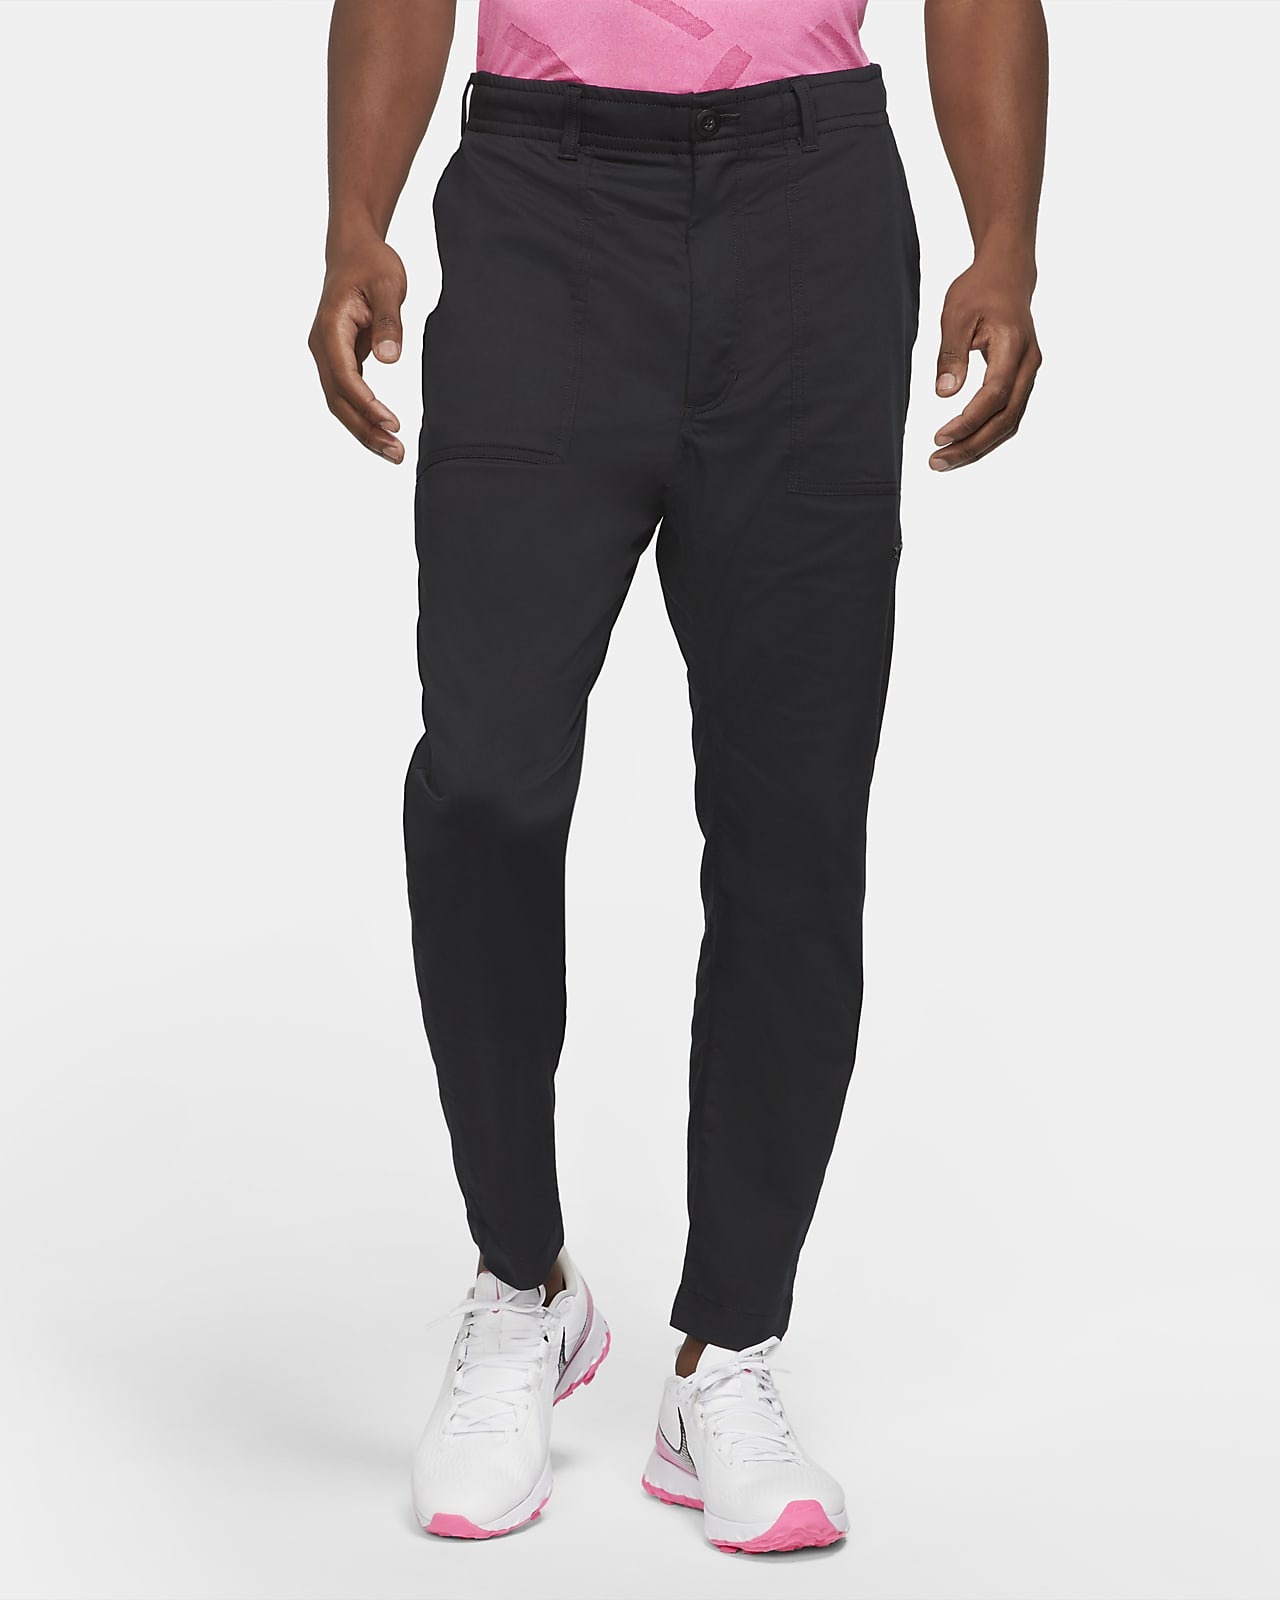 Nike Dri-FIT Herren-Golfhose